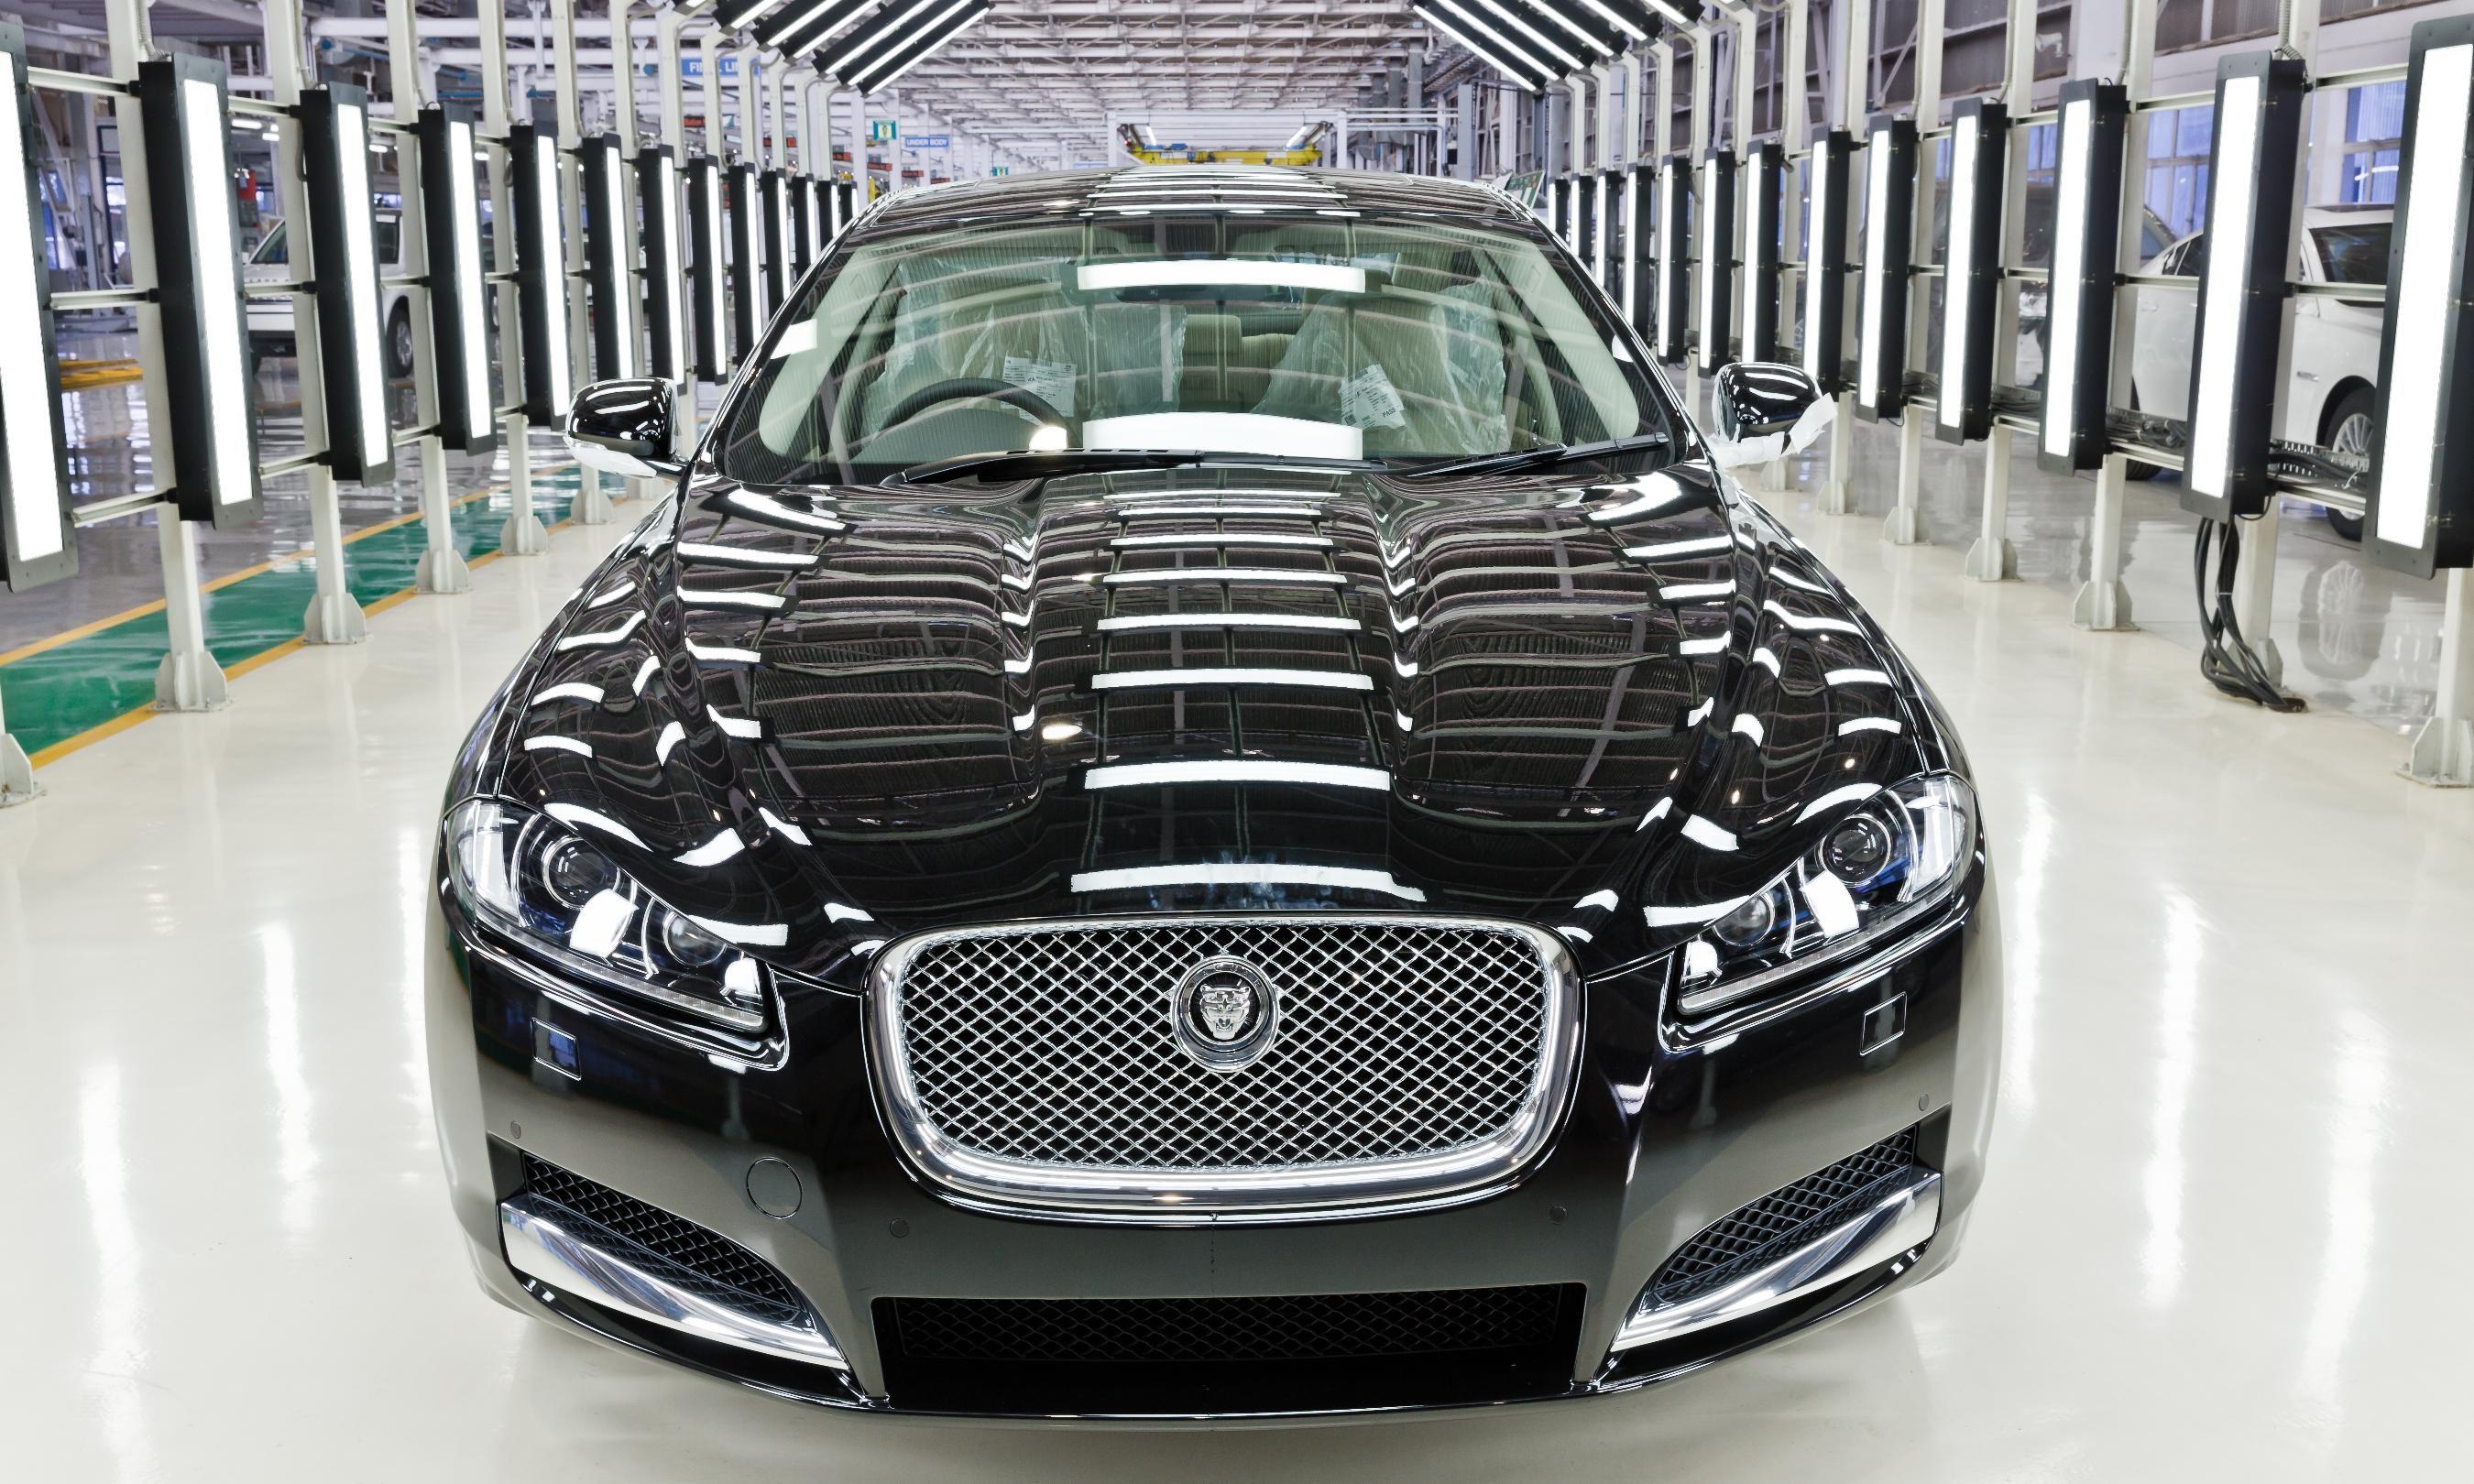 New Jaguar XF British-built compact saloon | Cars | Life &amp- Style ...